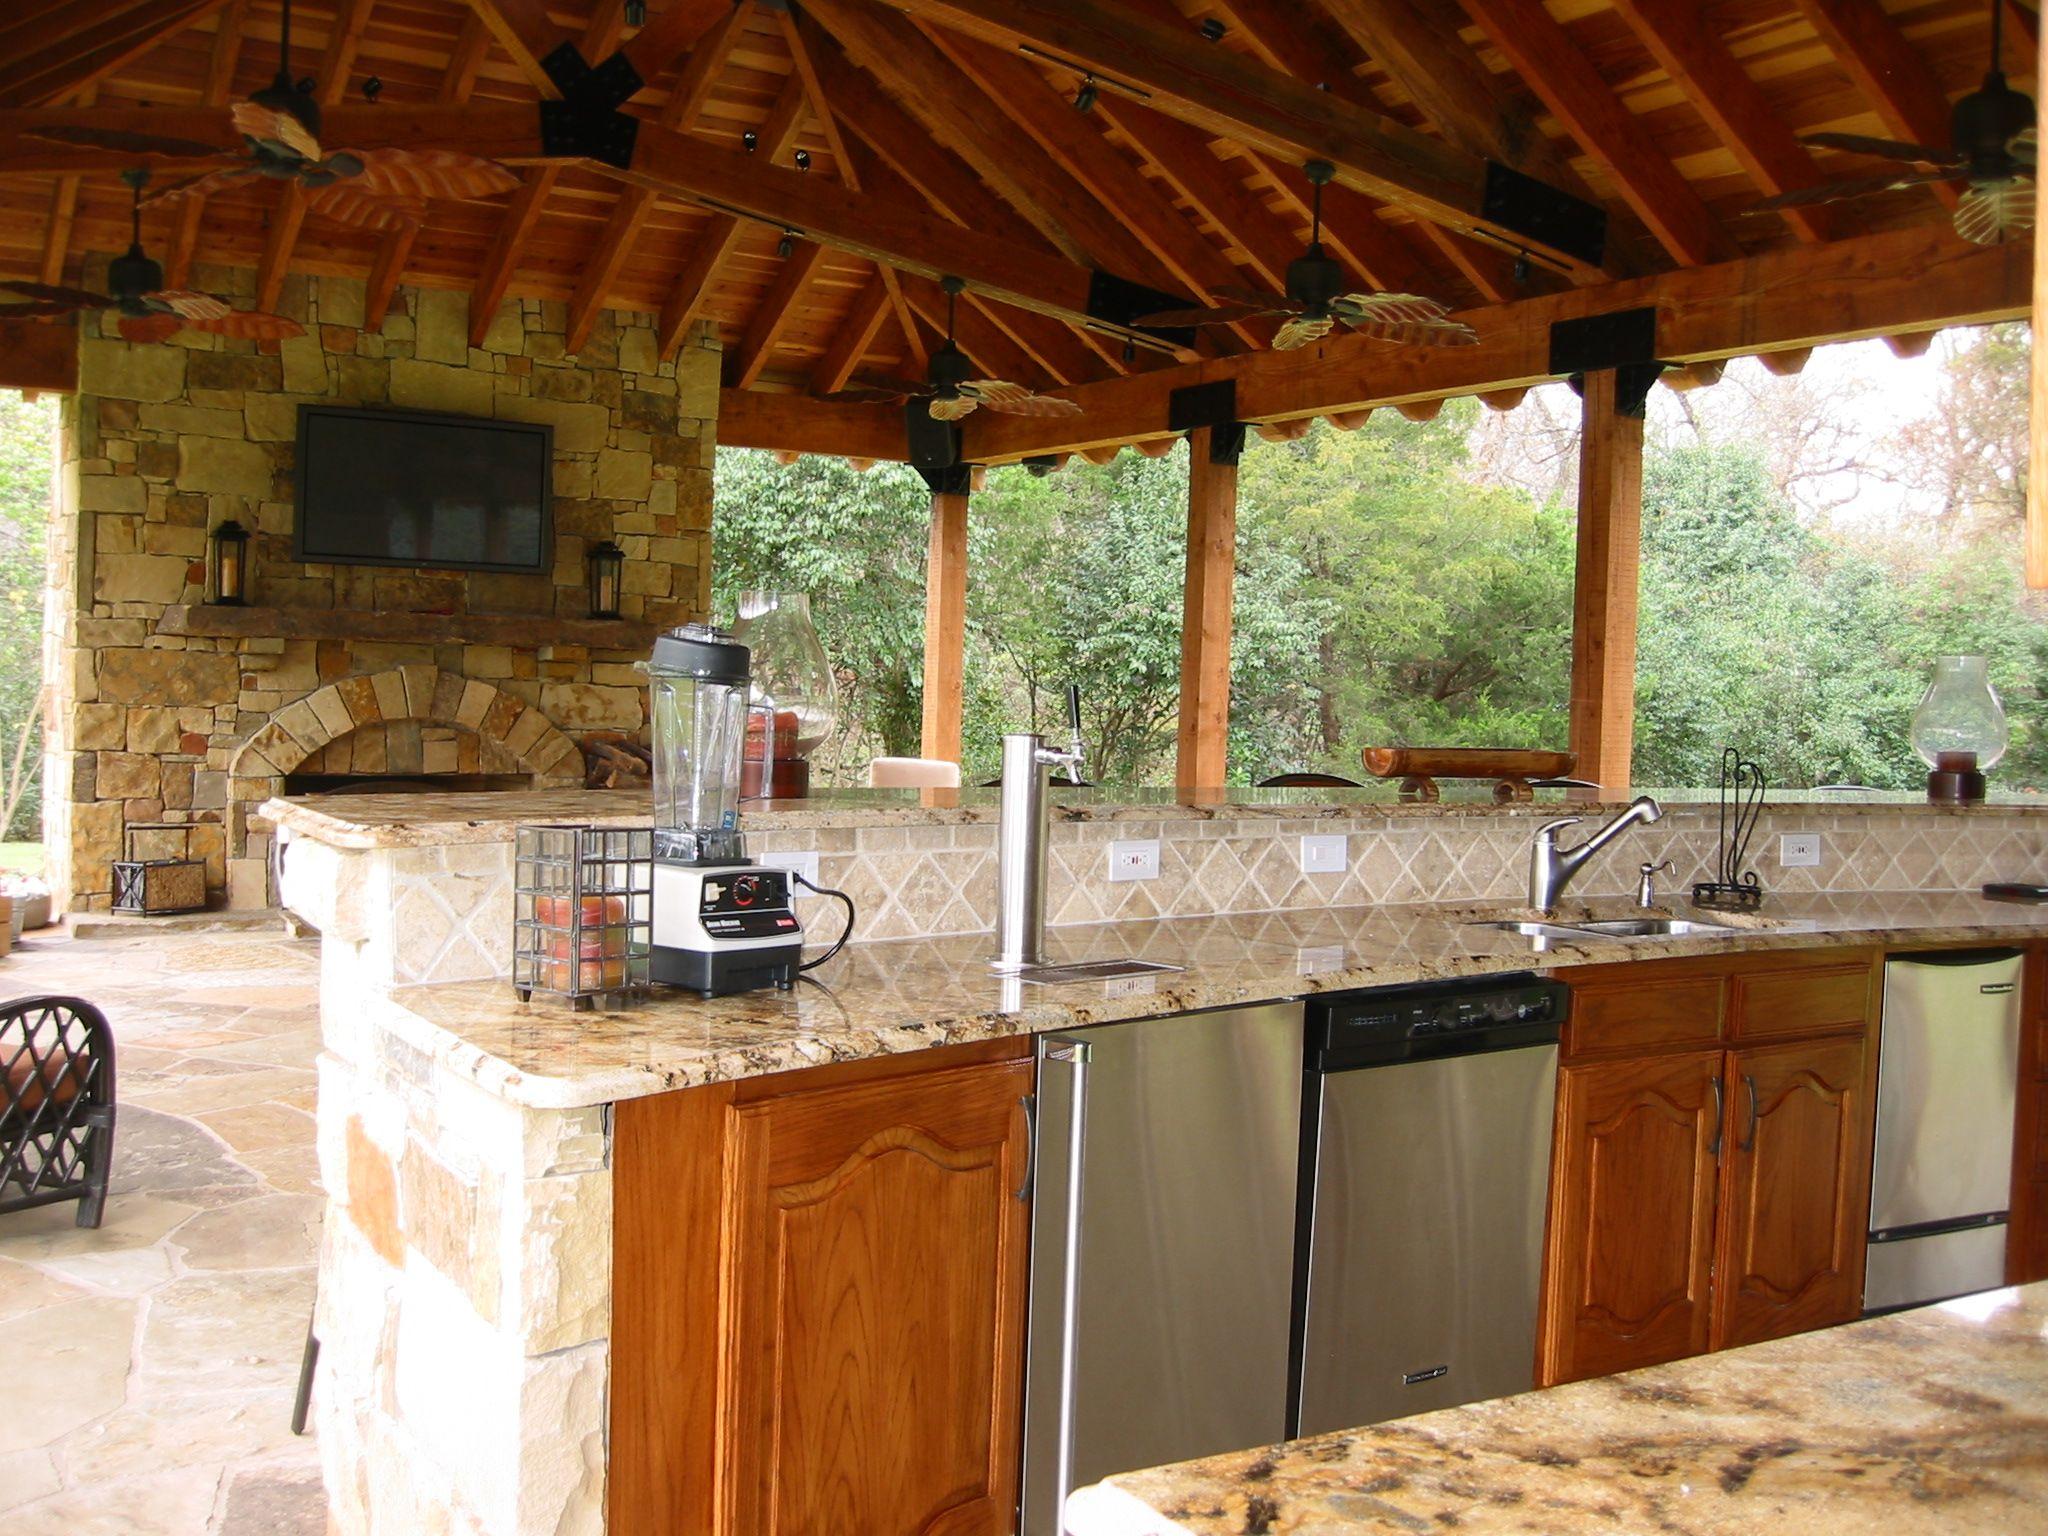 Texas regional design exposed ceiling beams stone facade for Texas outdoor kitchen ideas